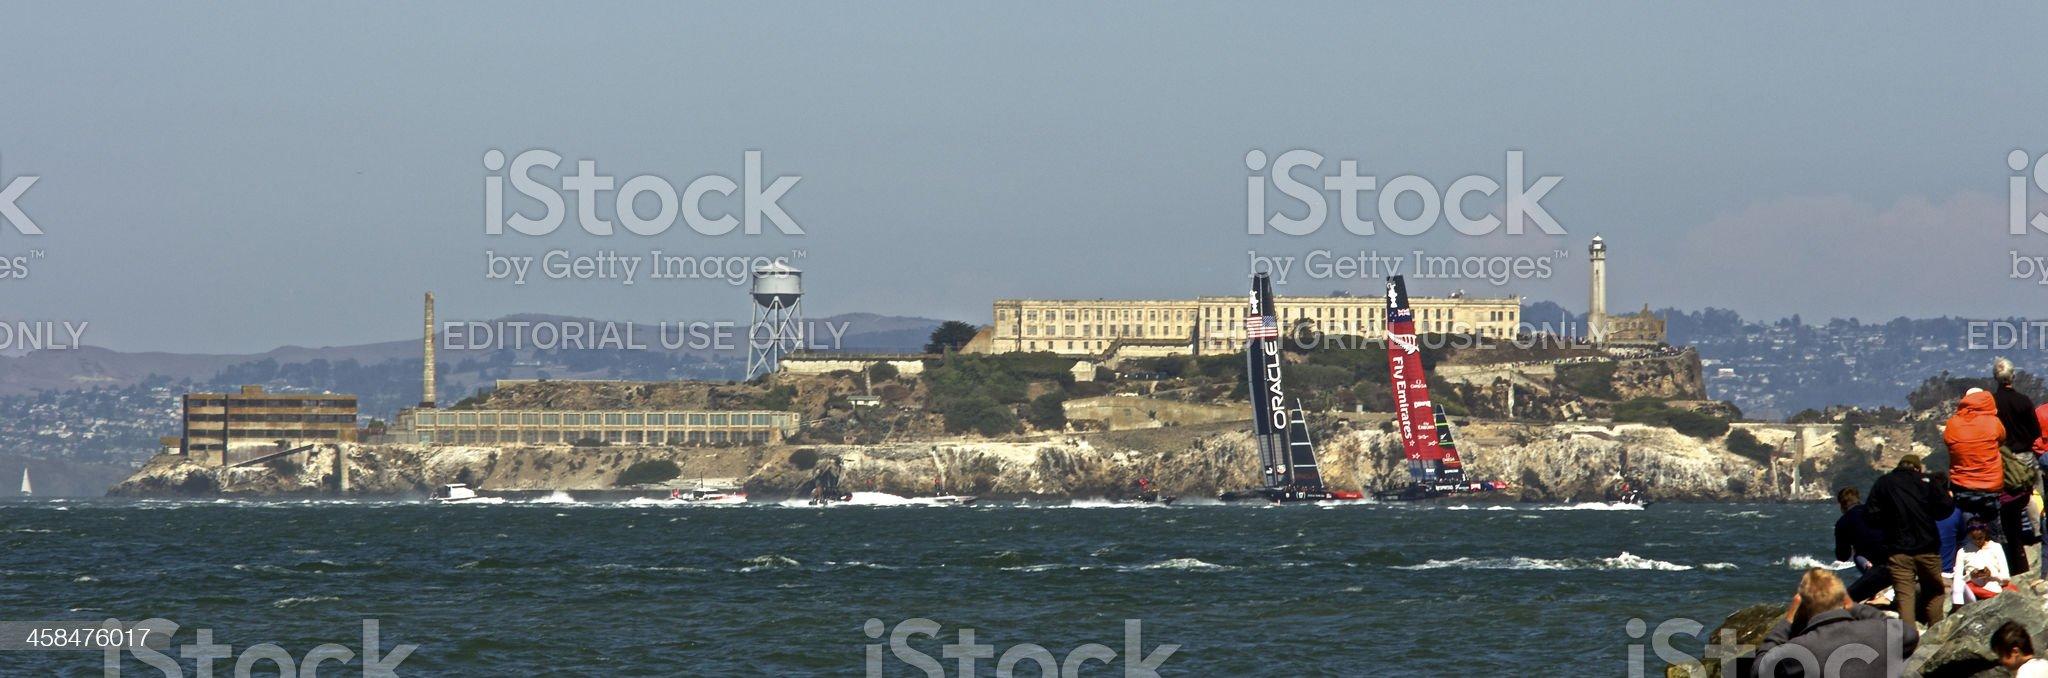 America's Cup NZ VS USA - Alcatraz royalty-free stock photo